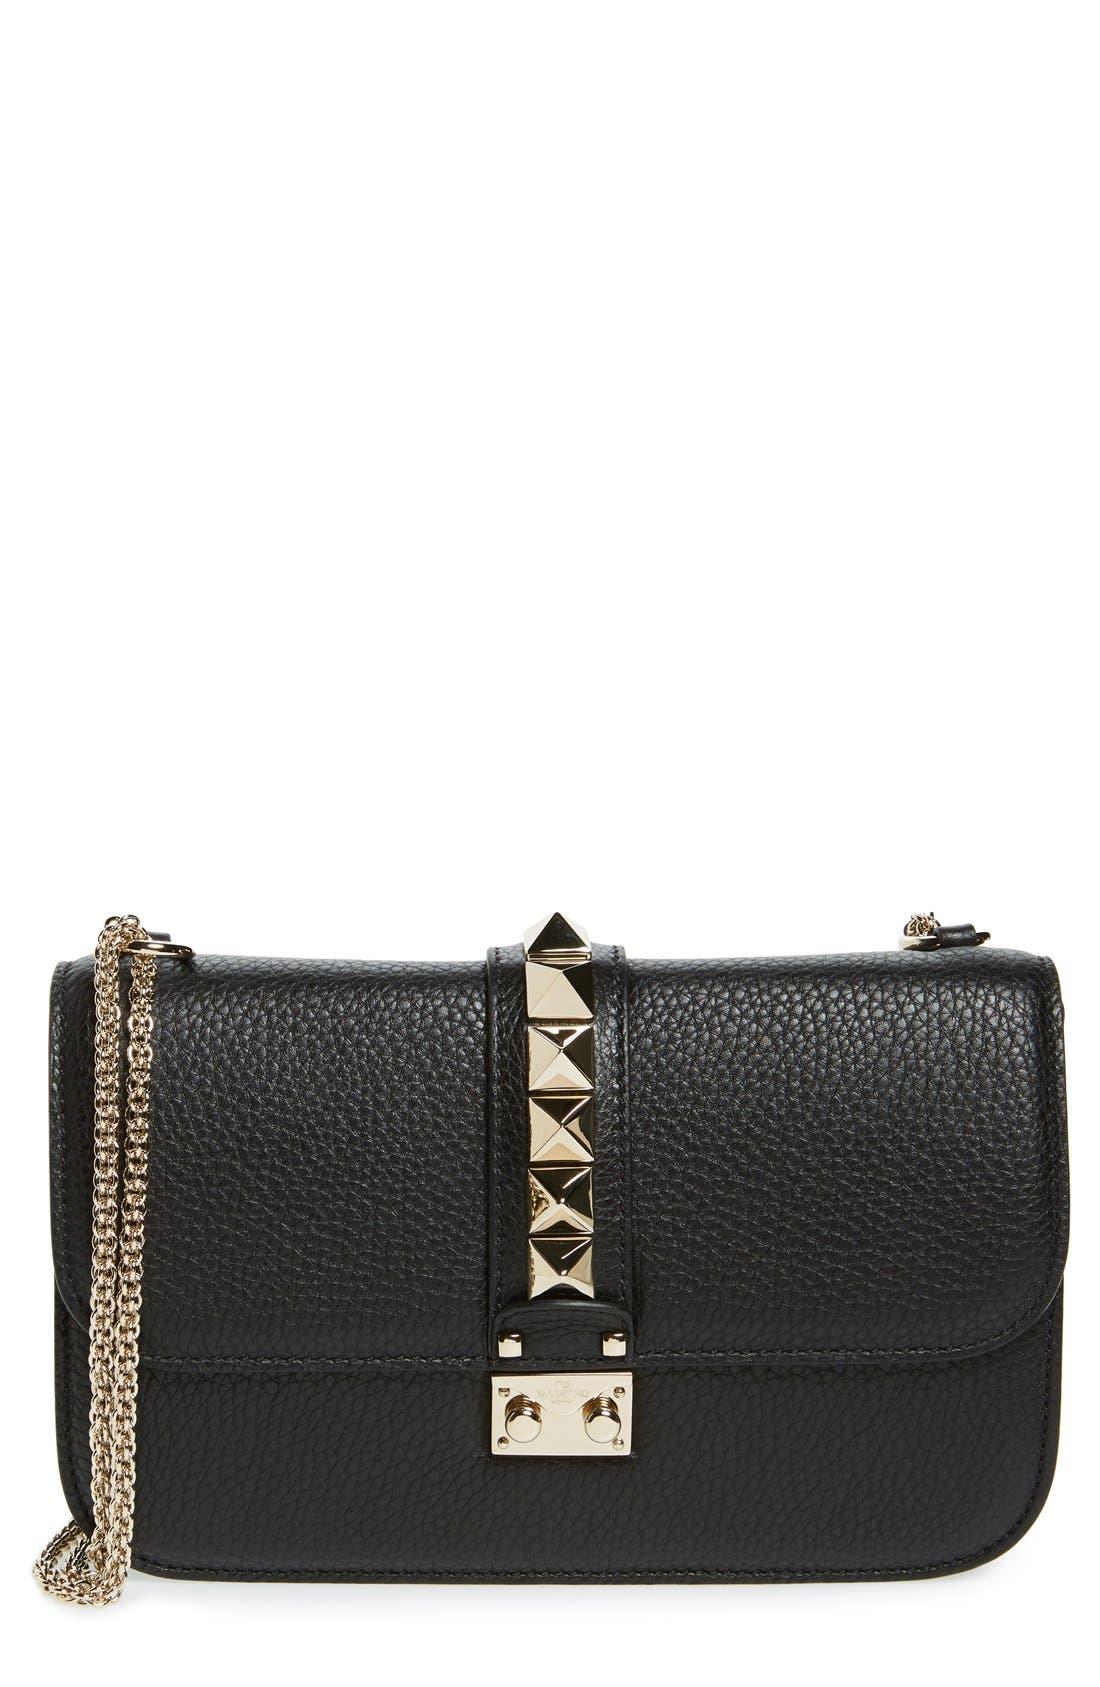 Main Image - VALENTINO GARAVANI Medium Lock Studded Leather Shoulder Bag